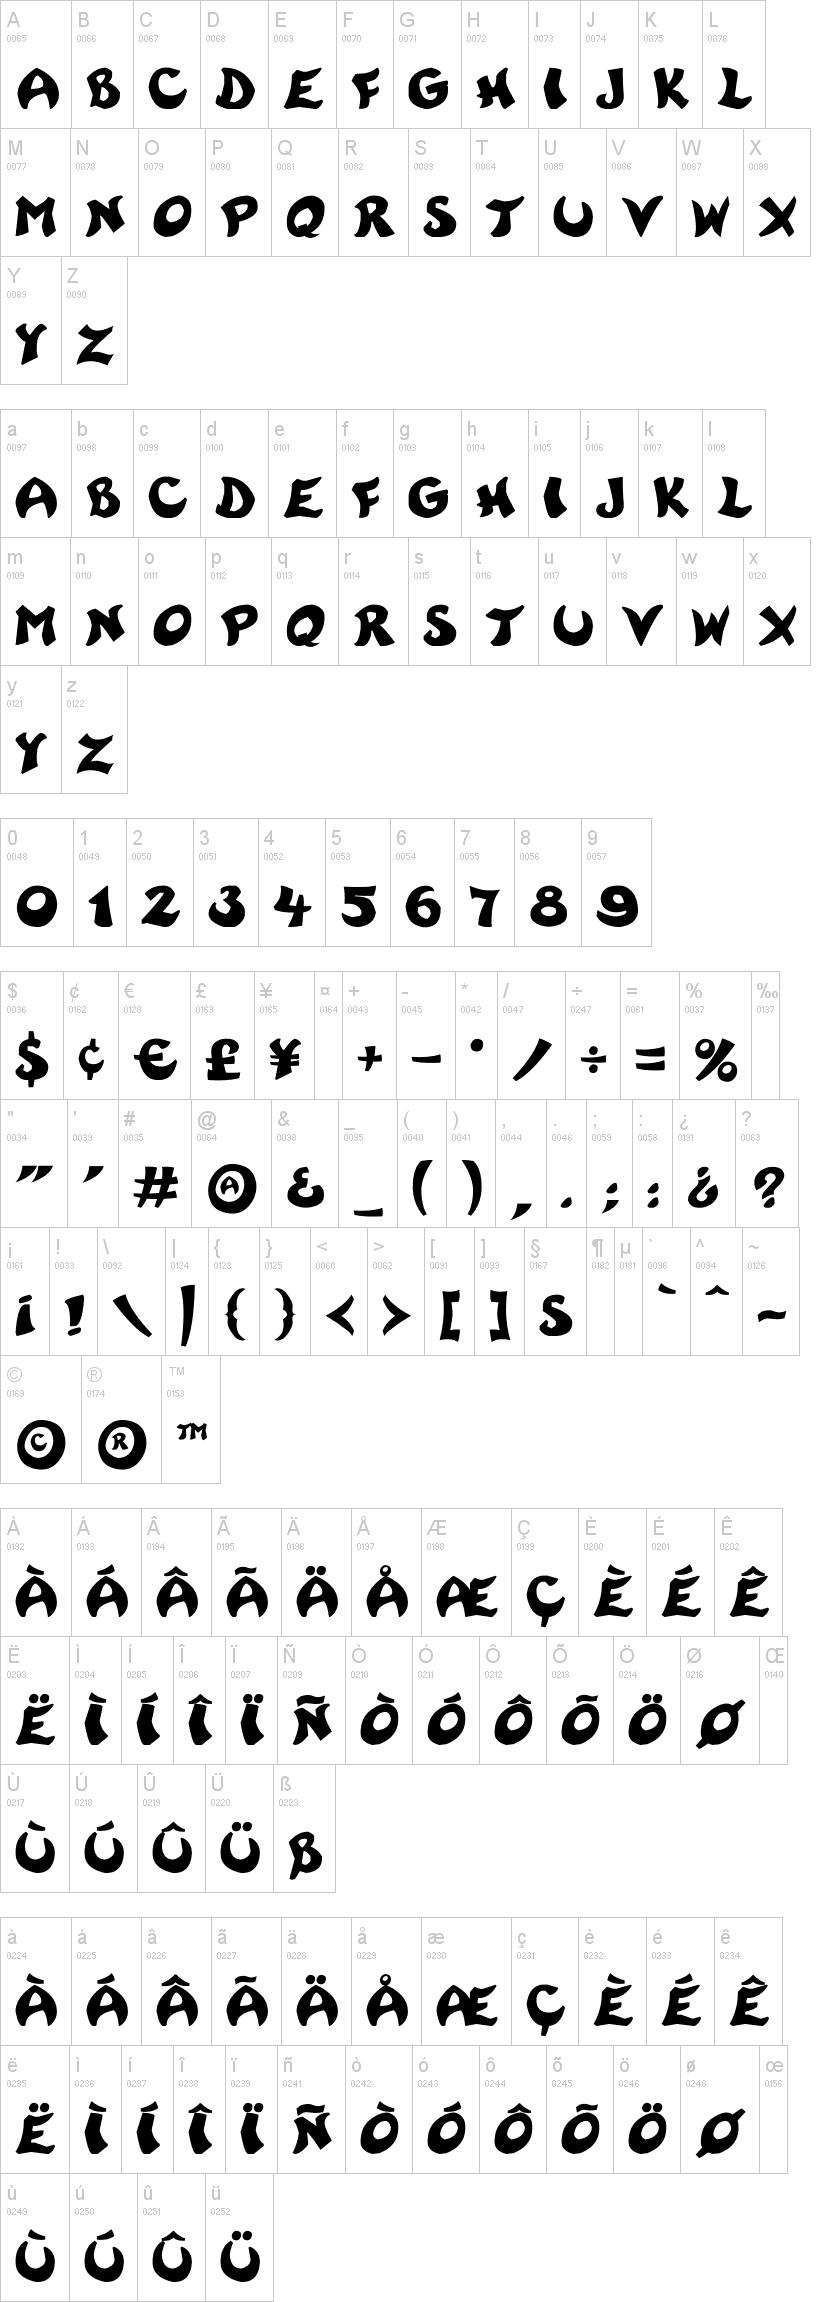 rayman adventures font